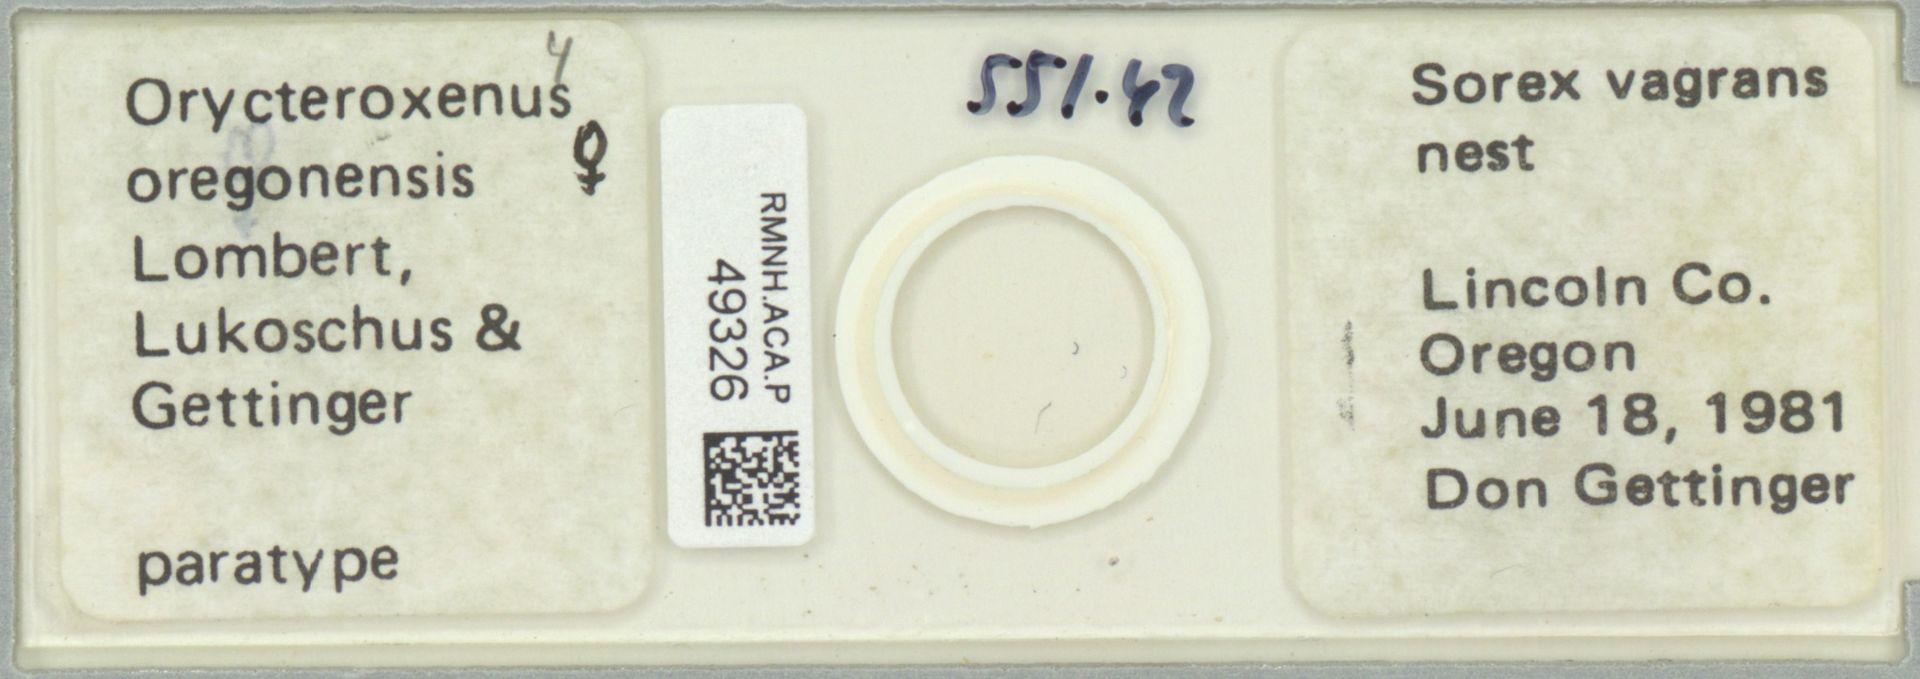 RMNH.ACA.P.49326   Orycteroxenus oregonensis Lombert, Lukoschus & Gettinger